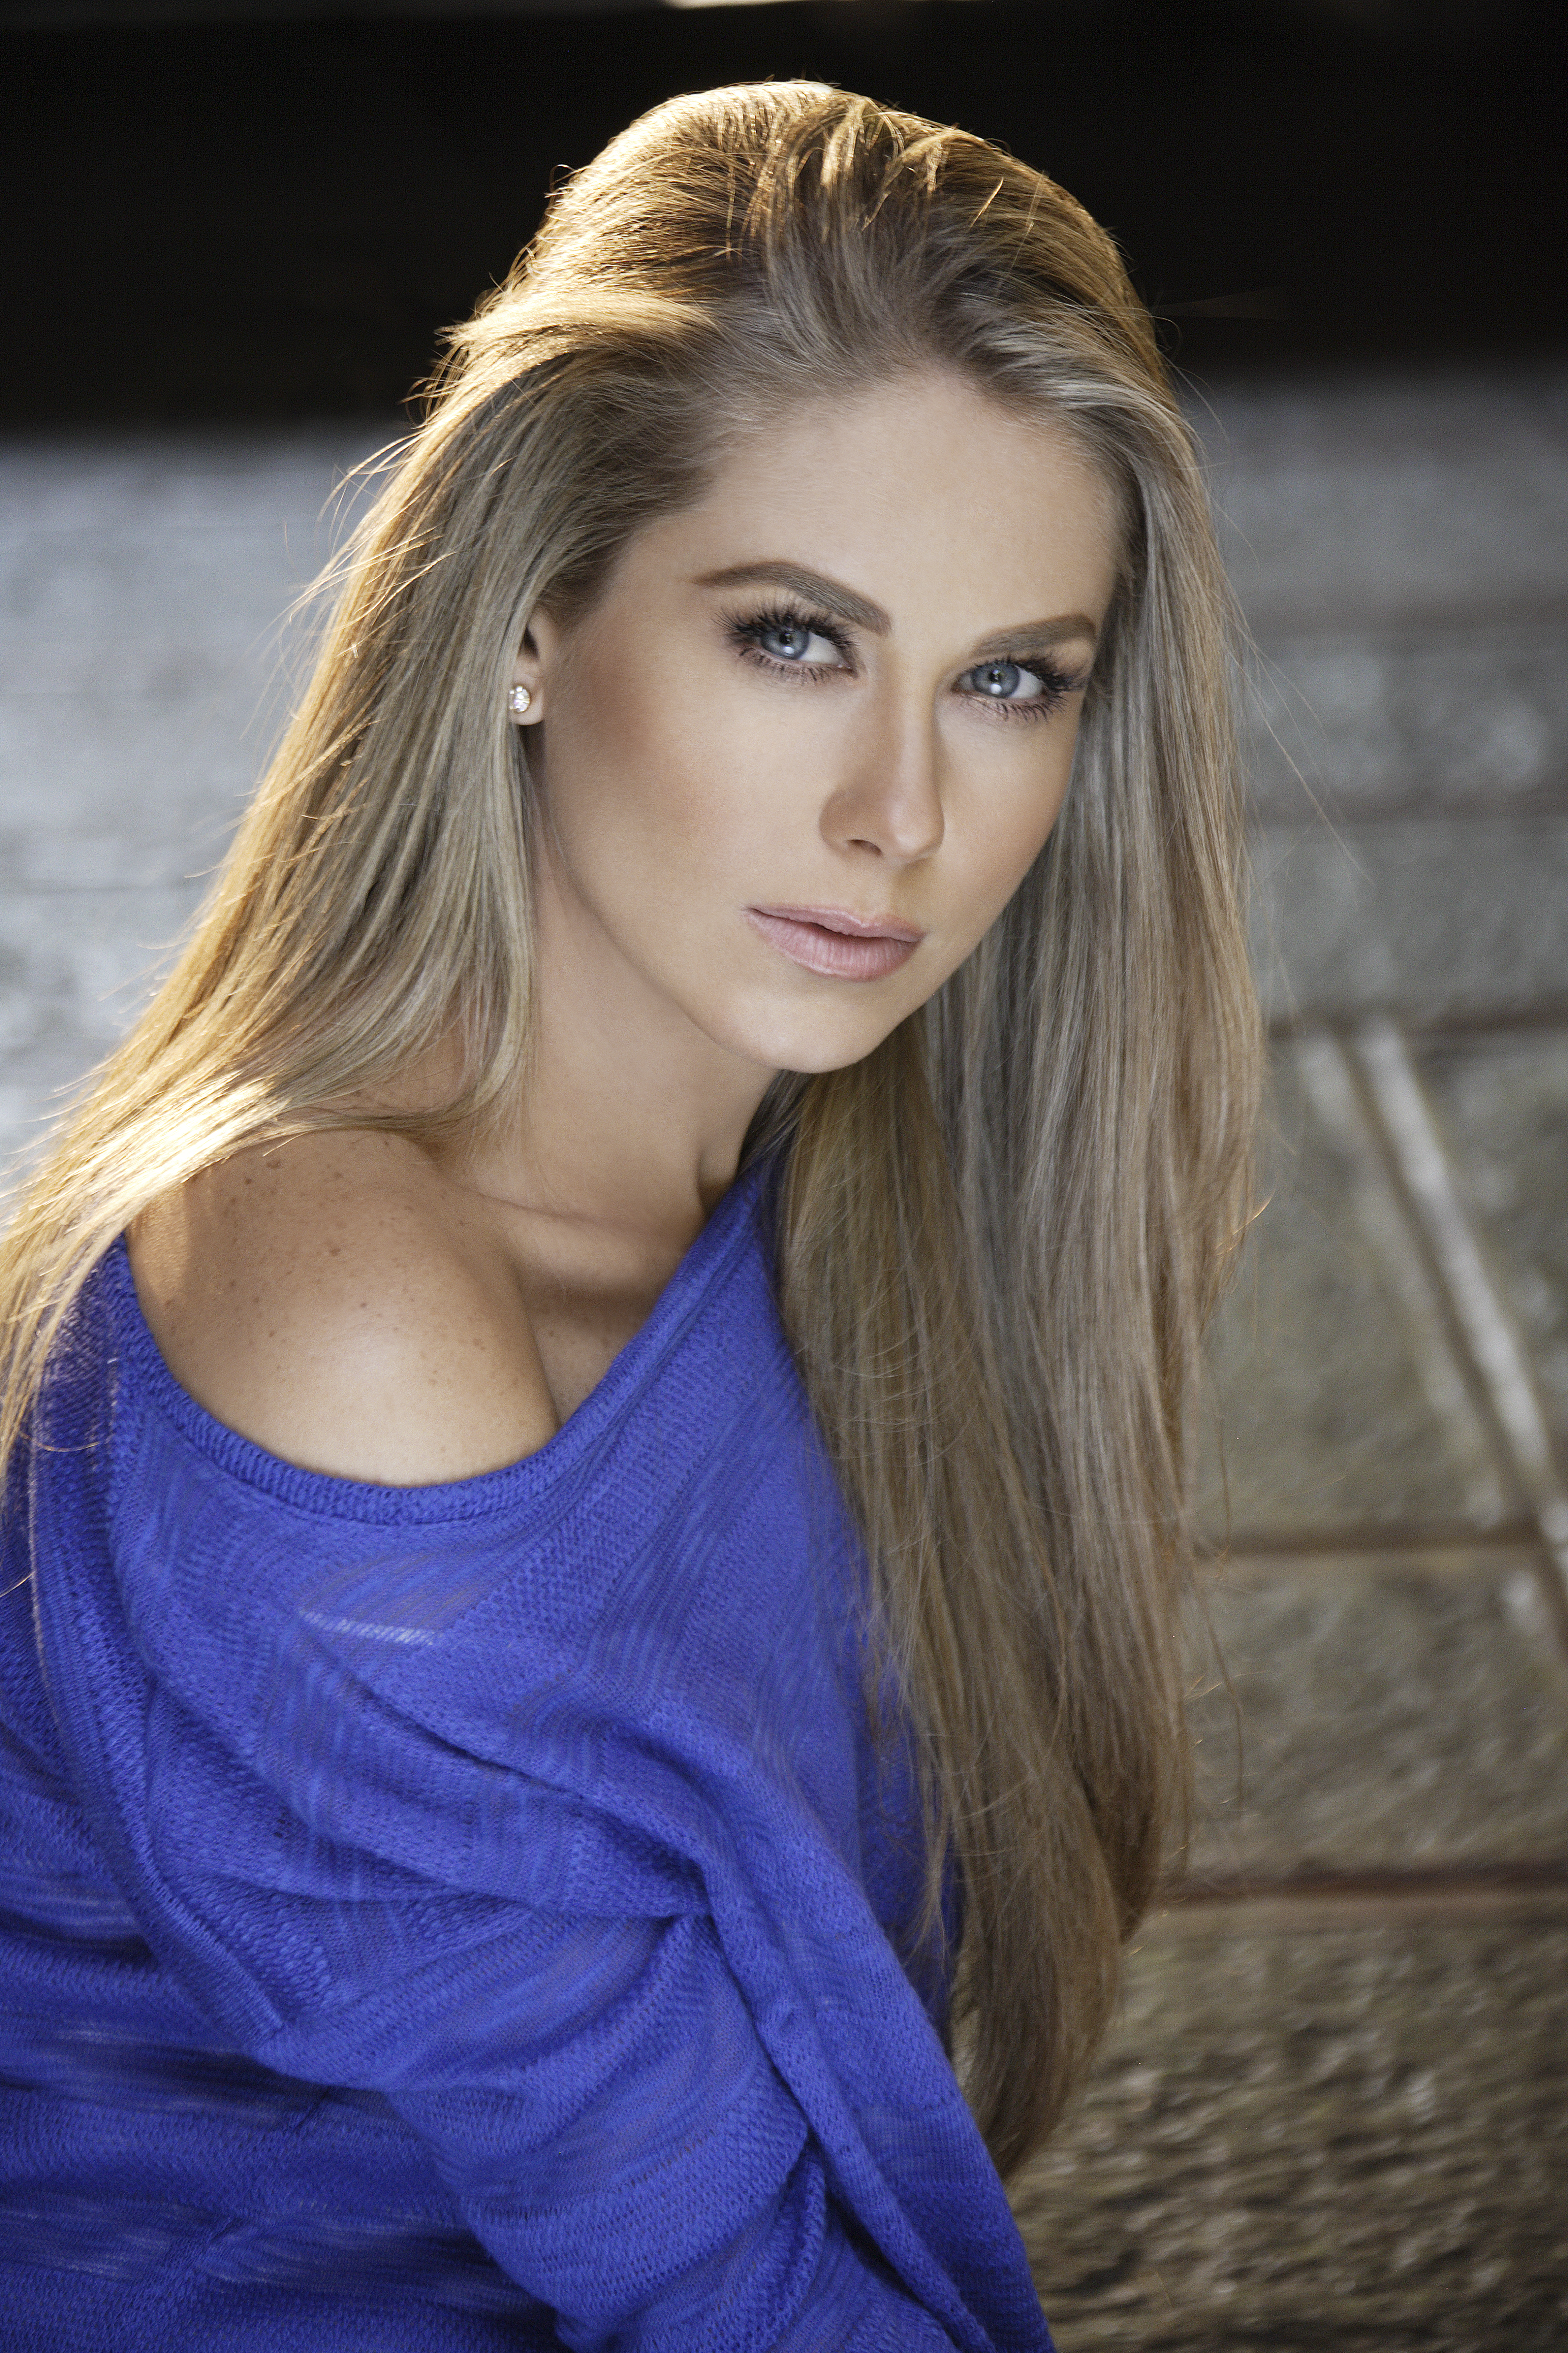 Ingrid Martz